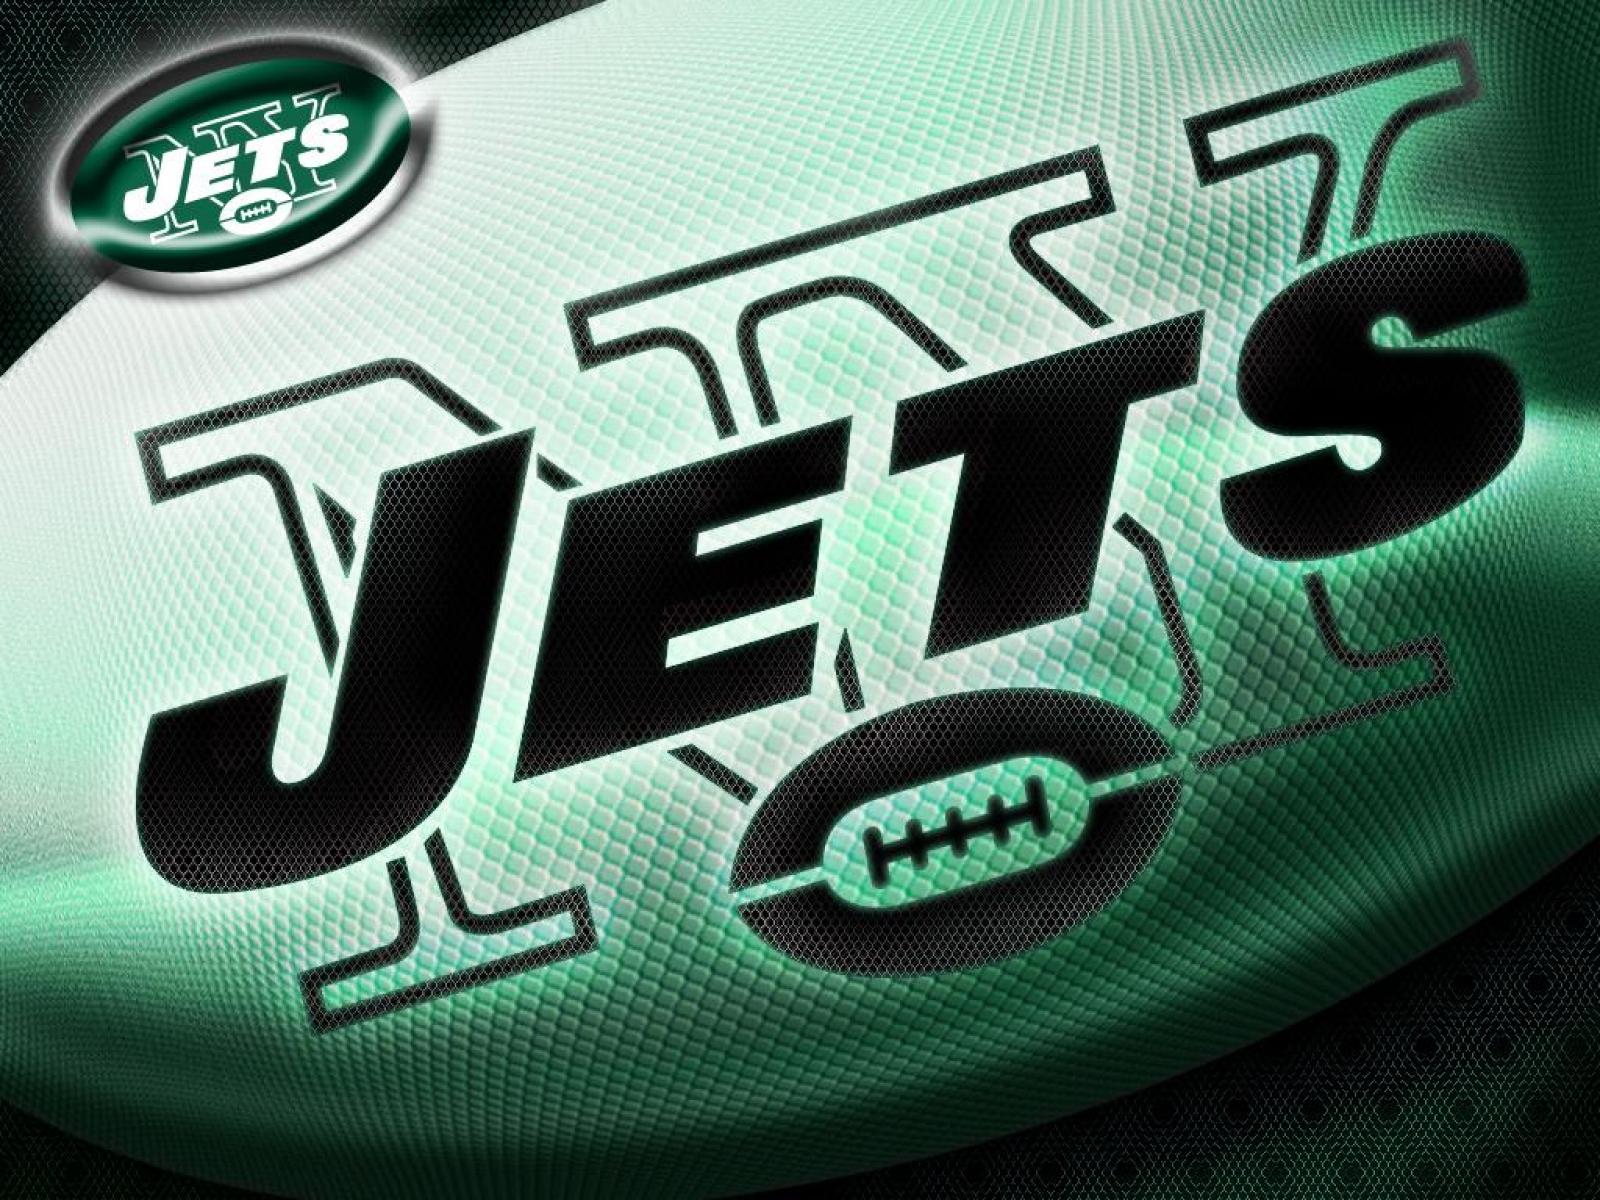 New York Jets Nfl Football G Wallpaper 1600x1200 157963